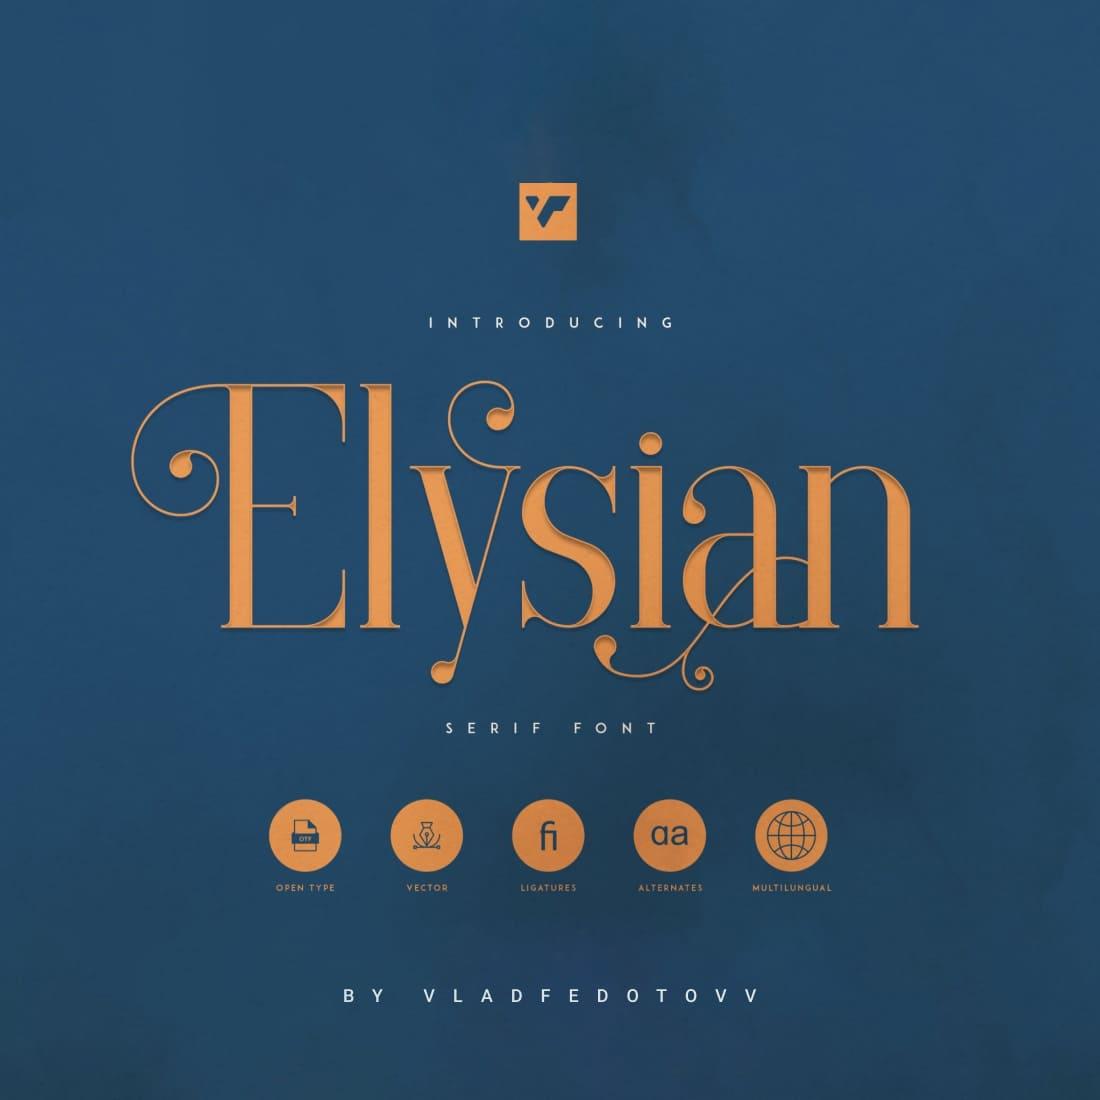 Elysian – Serif Font Cover image.